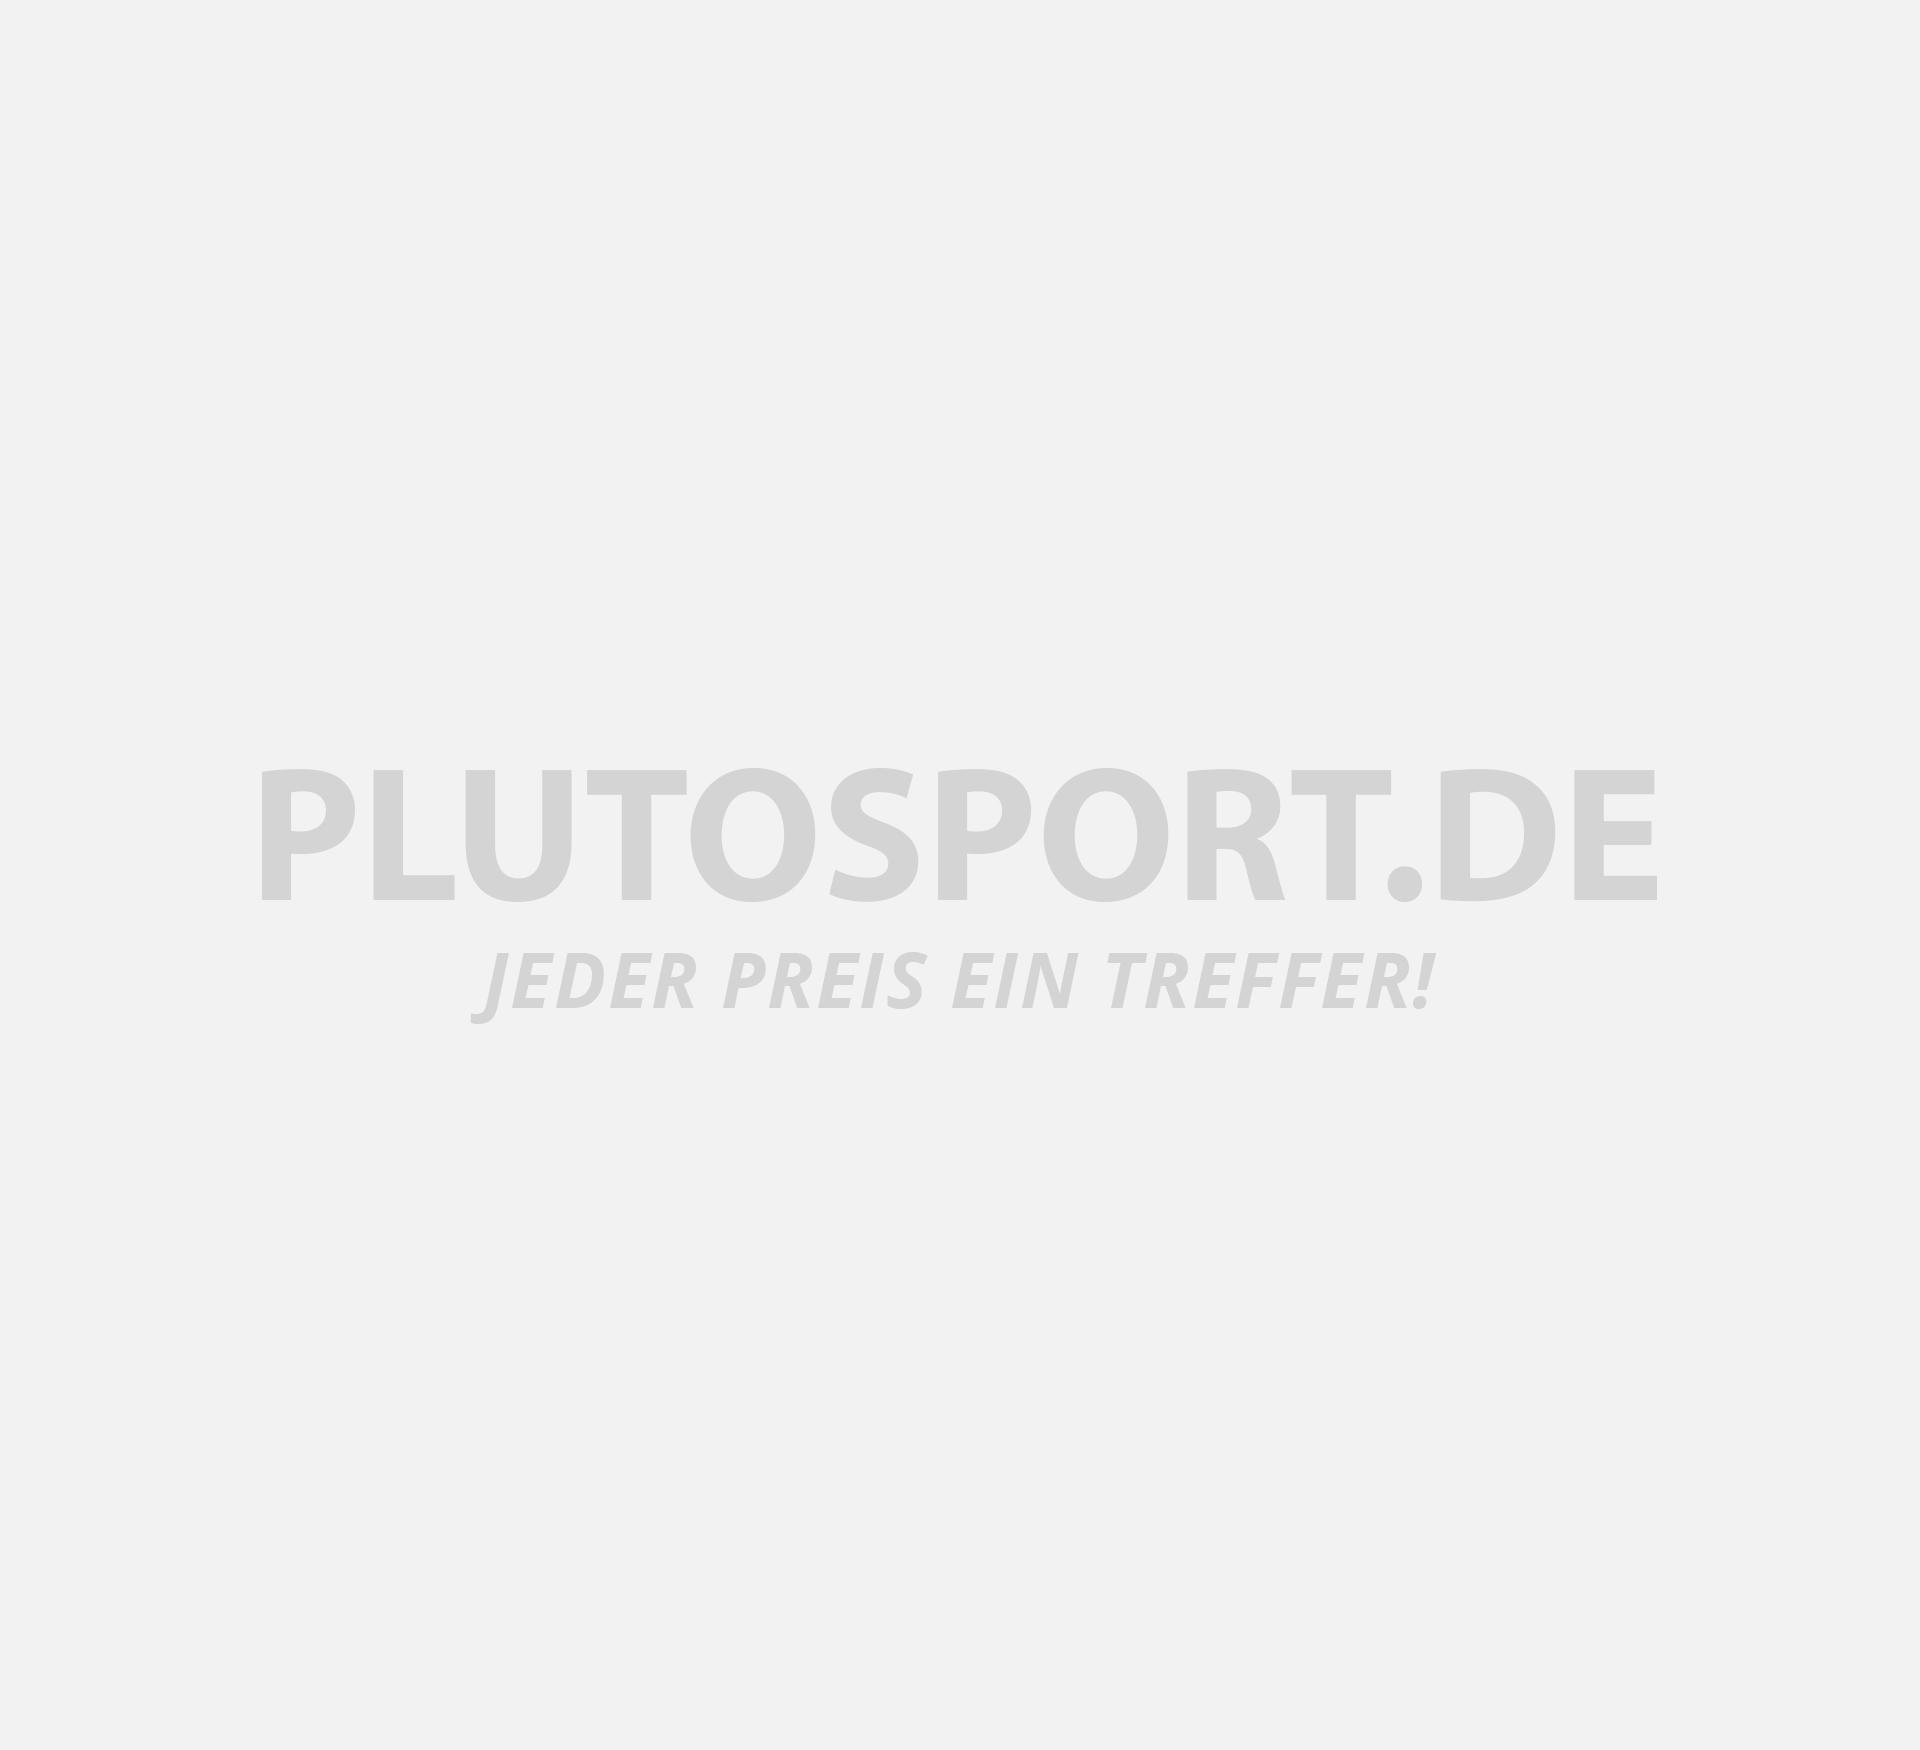 d1b6ca8e03b1 Damen Schuhe Puma Sneakers Wildleder Sneaker Benecio Freizeit w7B7qt8zx